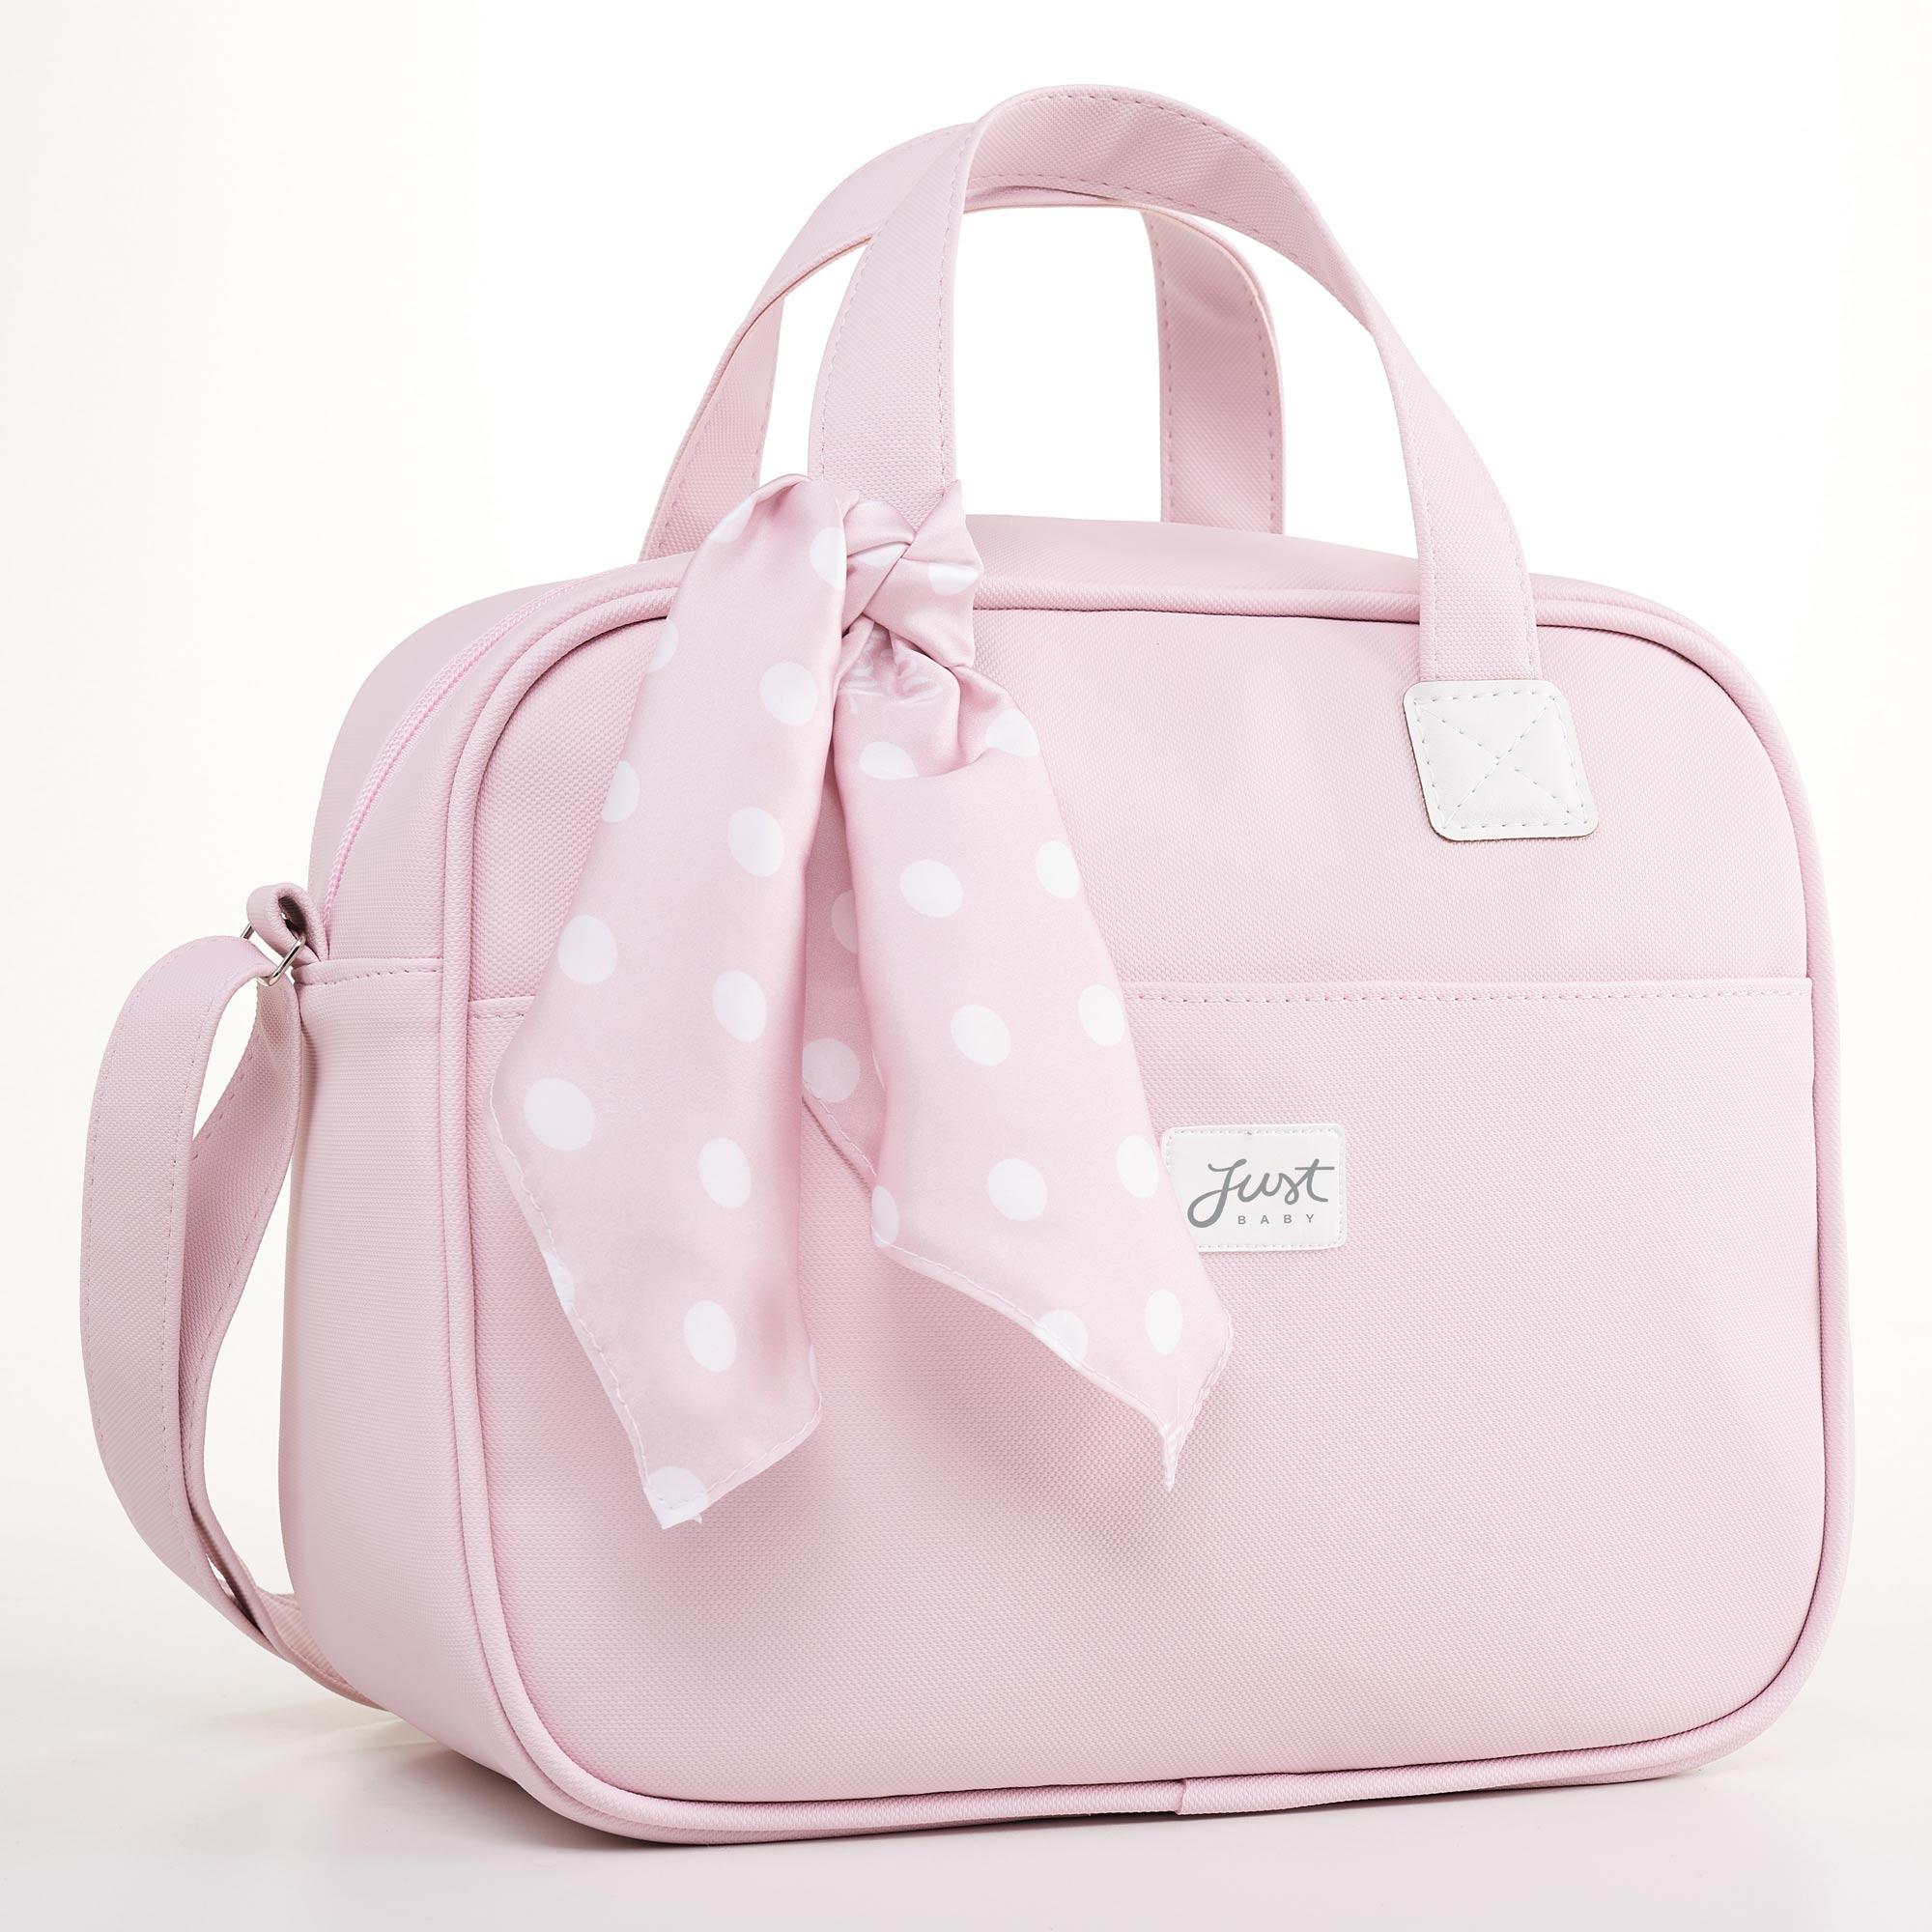 Frasqueira candy rosa